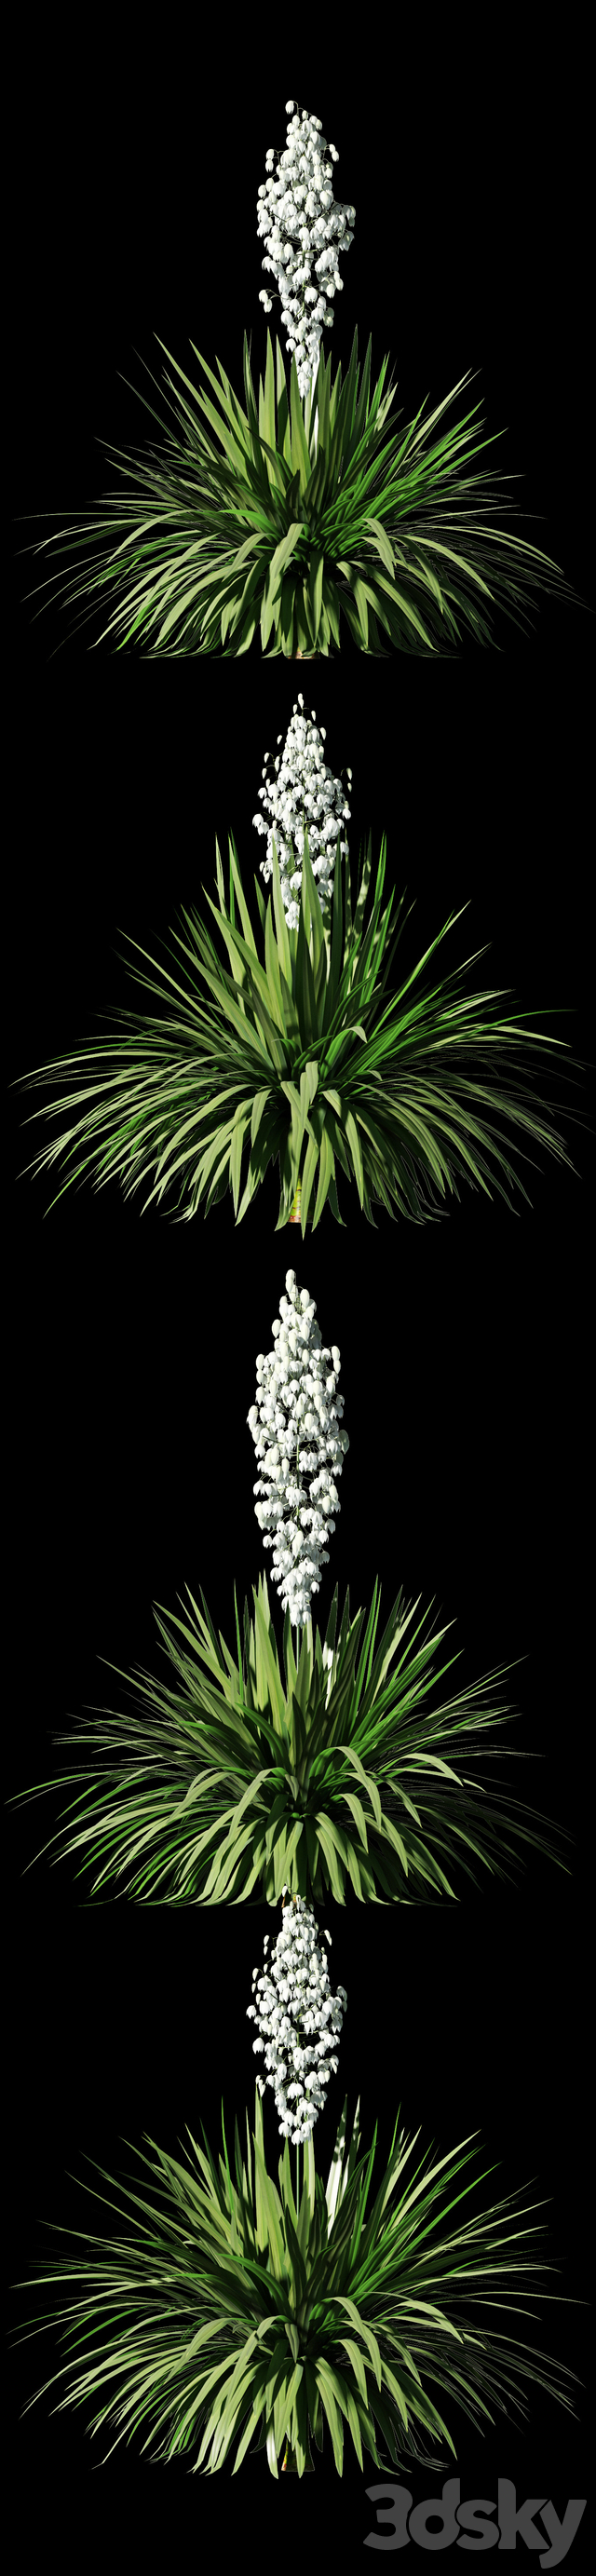 A blossoming yucca. 4 models